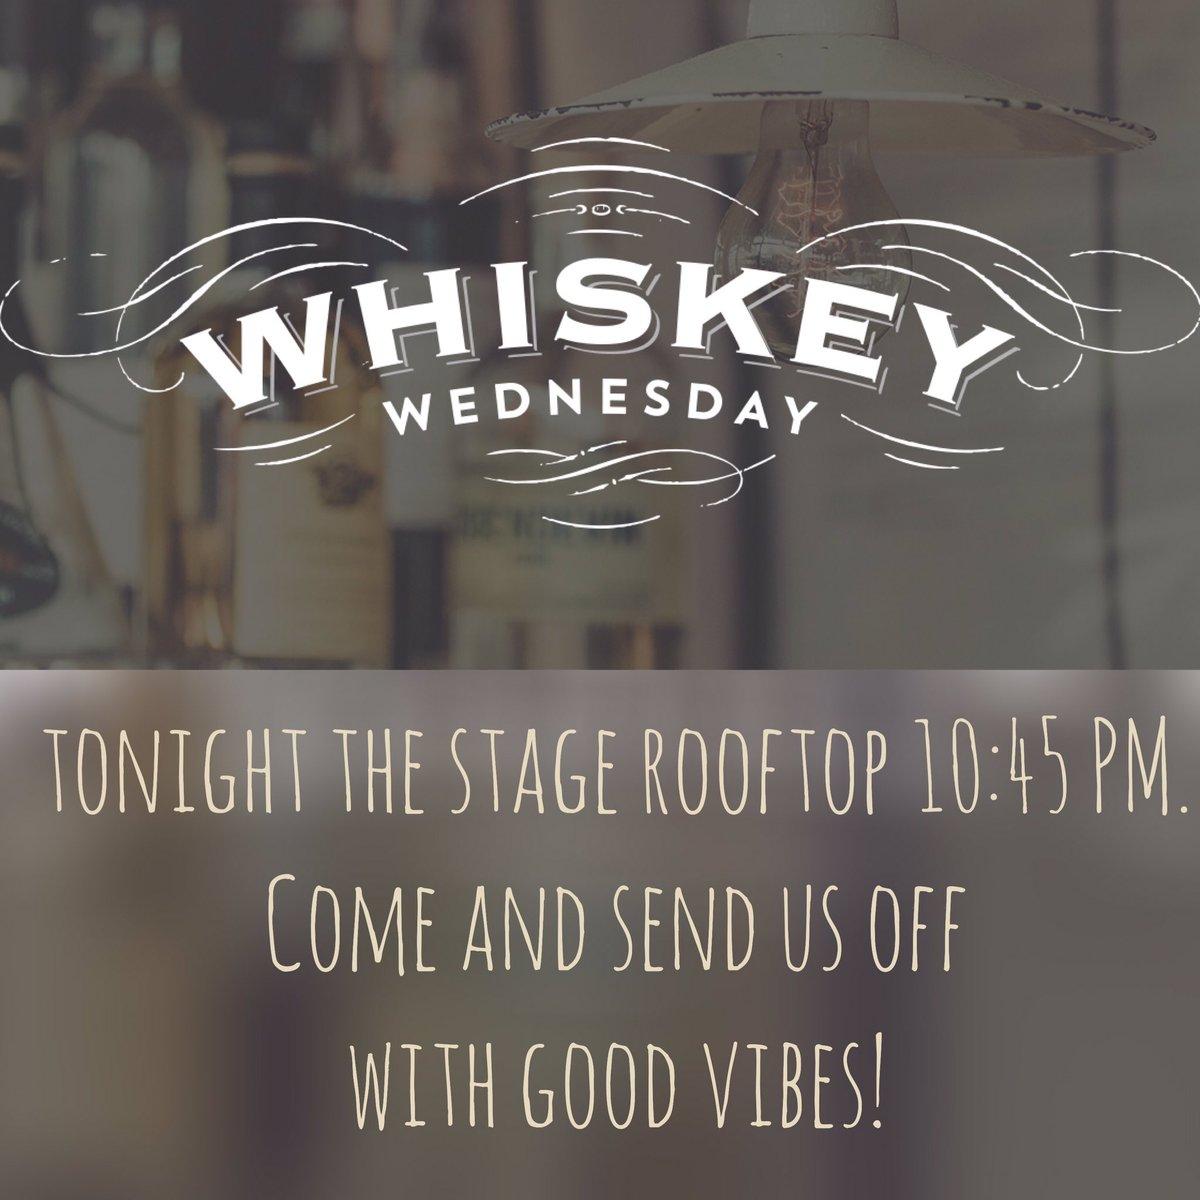 Come out tonight The Stage Rooftop! #whiskeywednesday #tour #alanjackson #alanjacksontour #downtown #nashvillepic.twitter.com/mHeGr03031